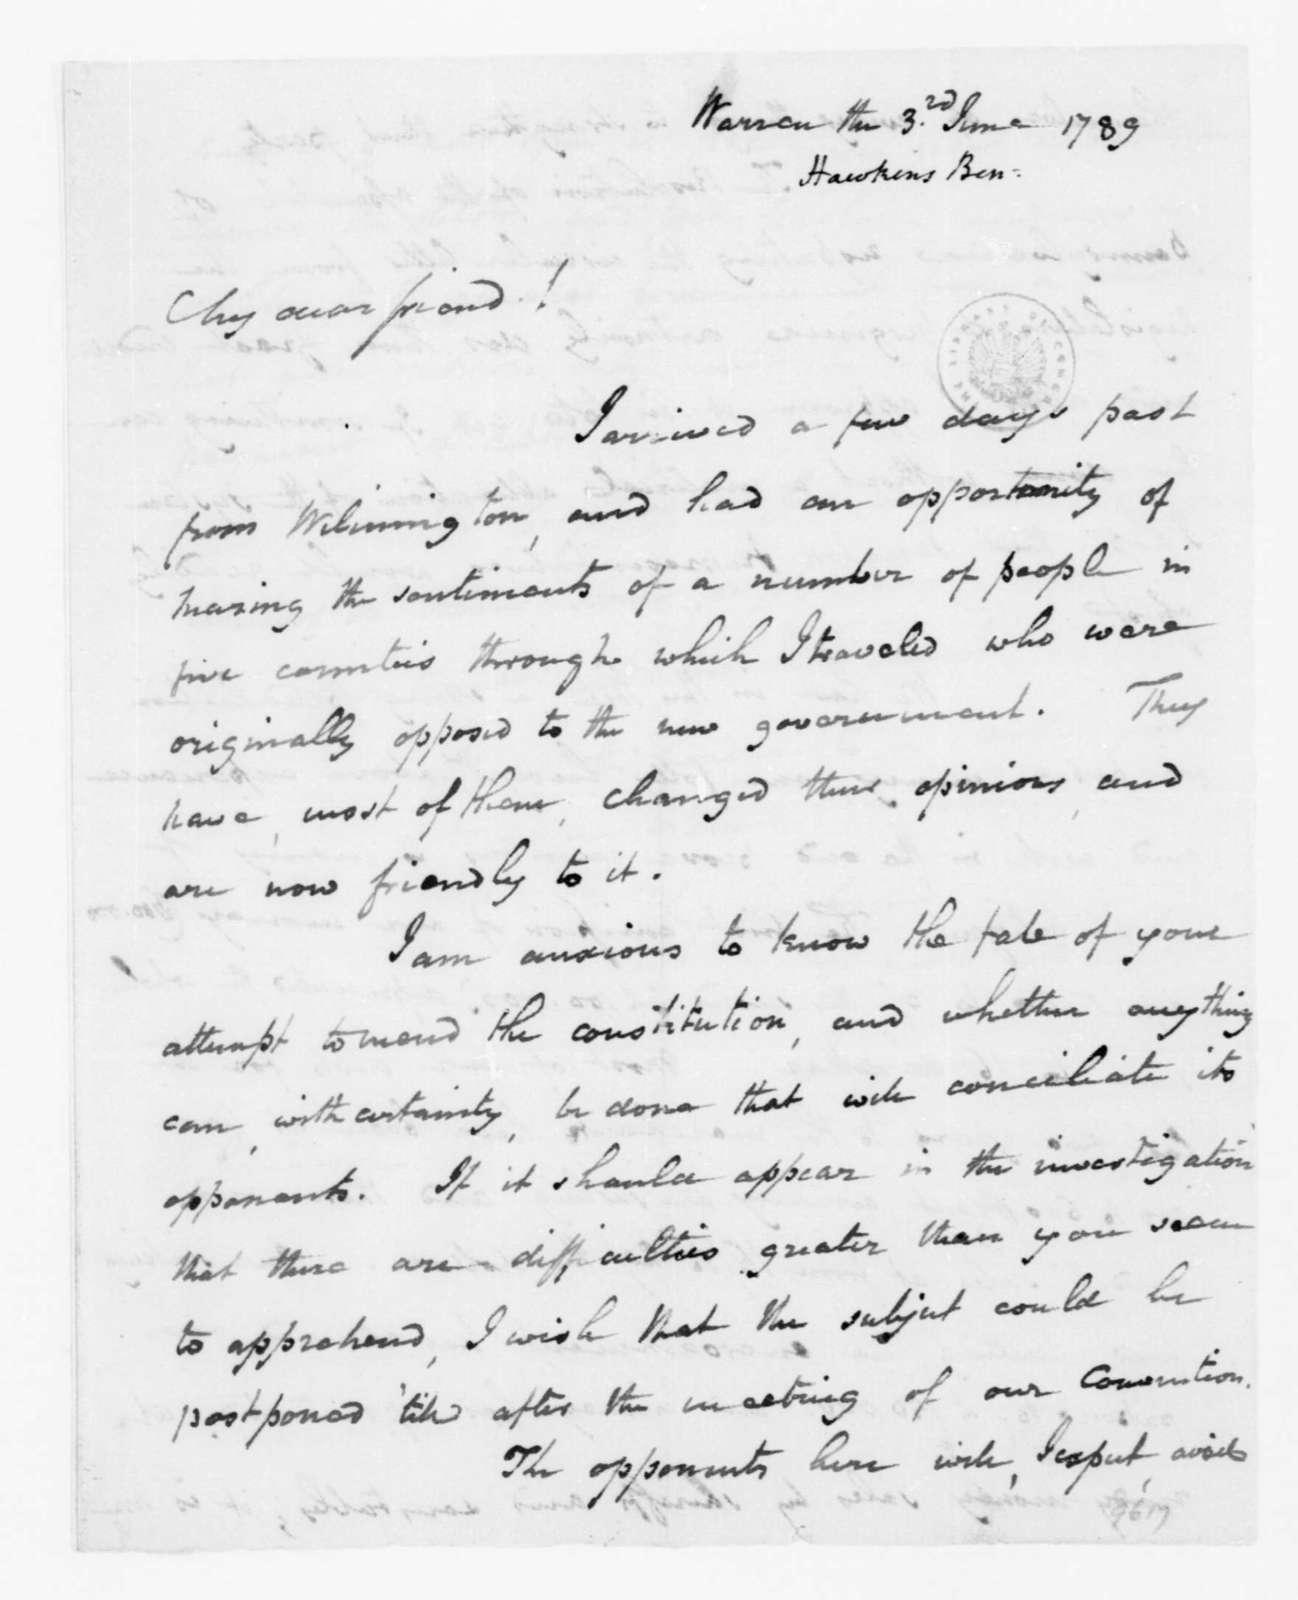 Benjamin Hawkins to James Madison, June 3, 1789.